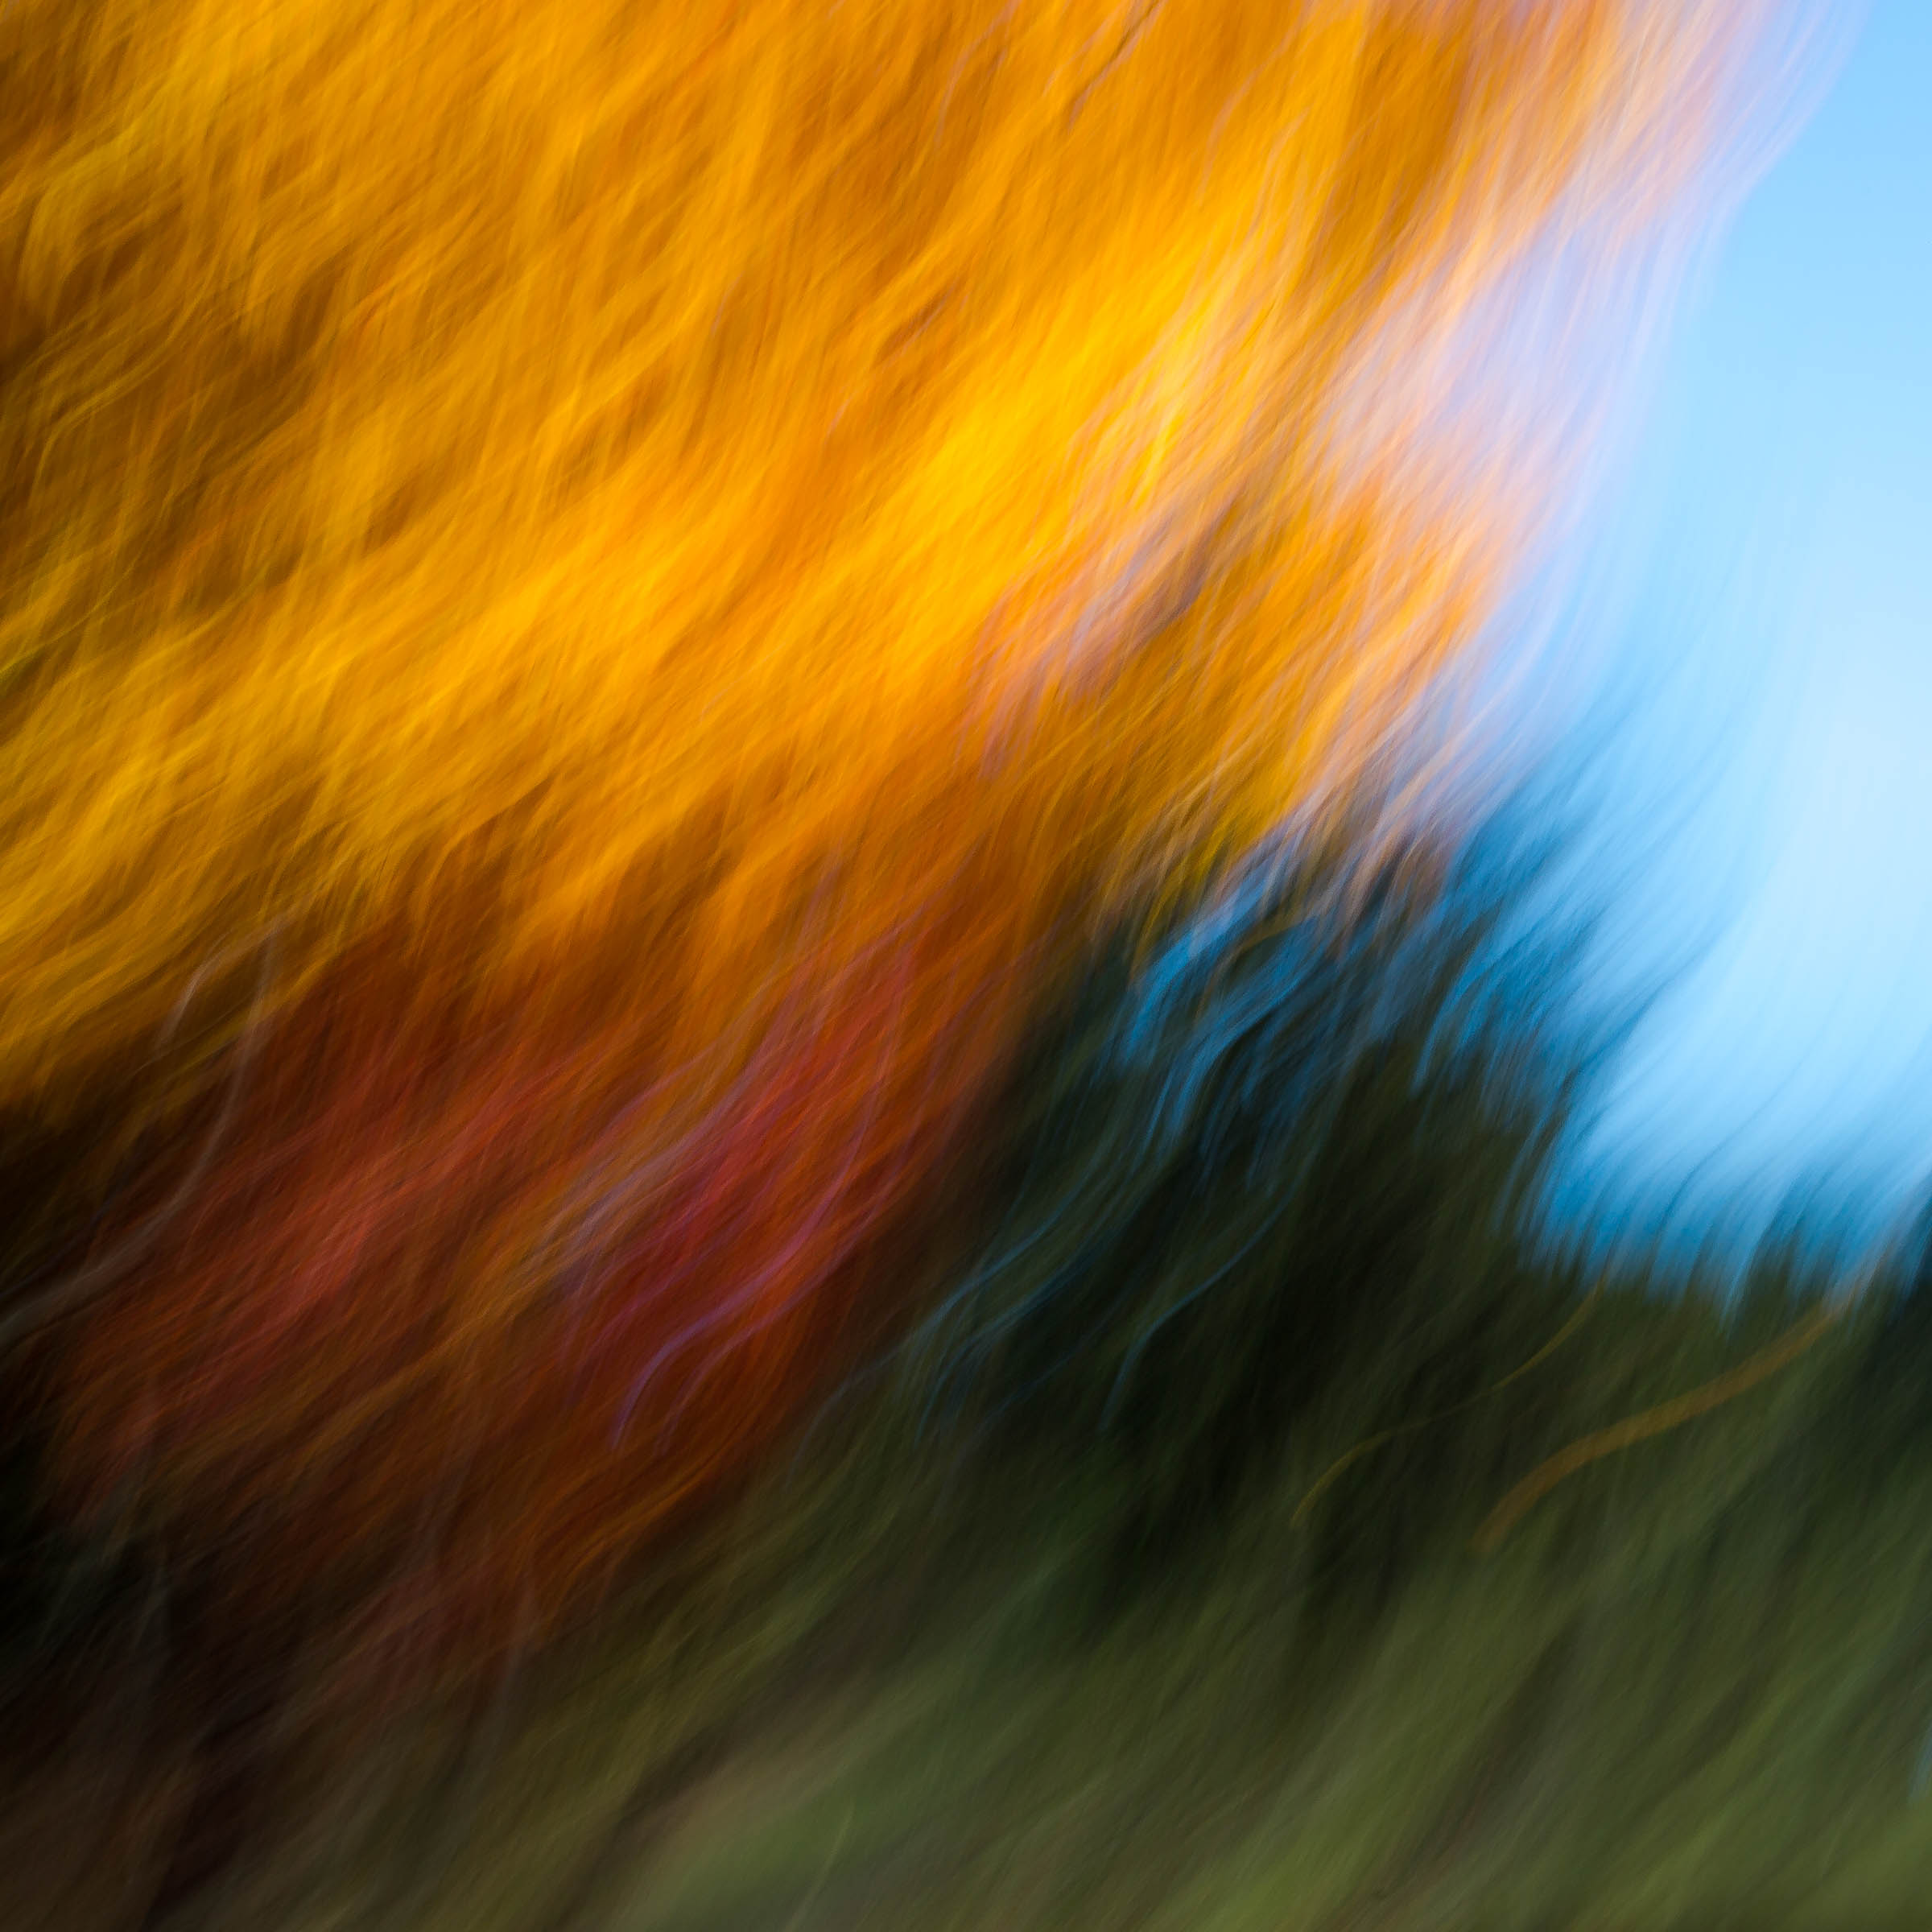 _MGL7029_Woodlands Diptych #2.jpg